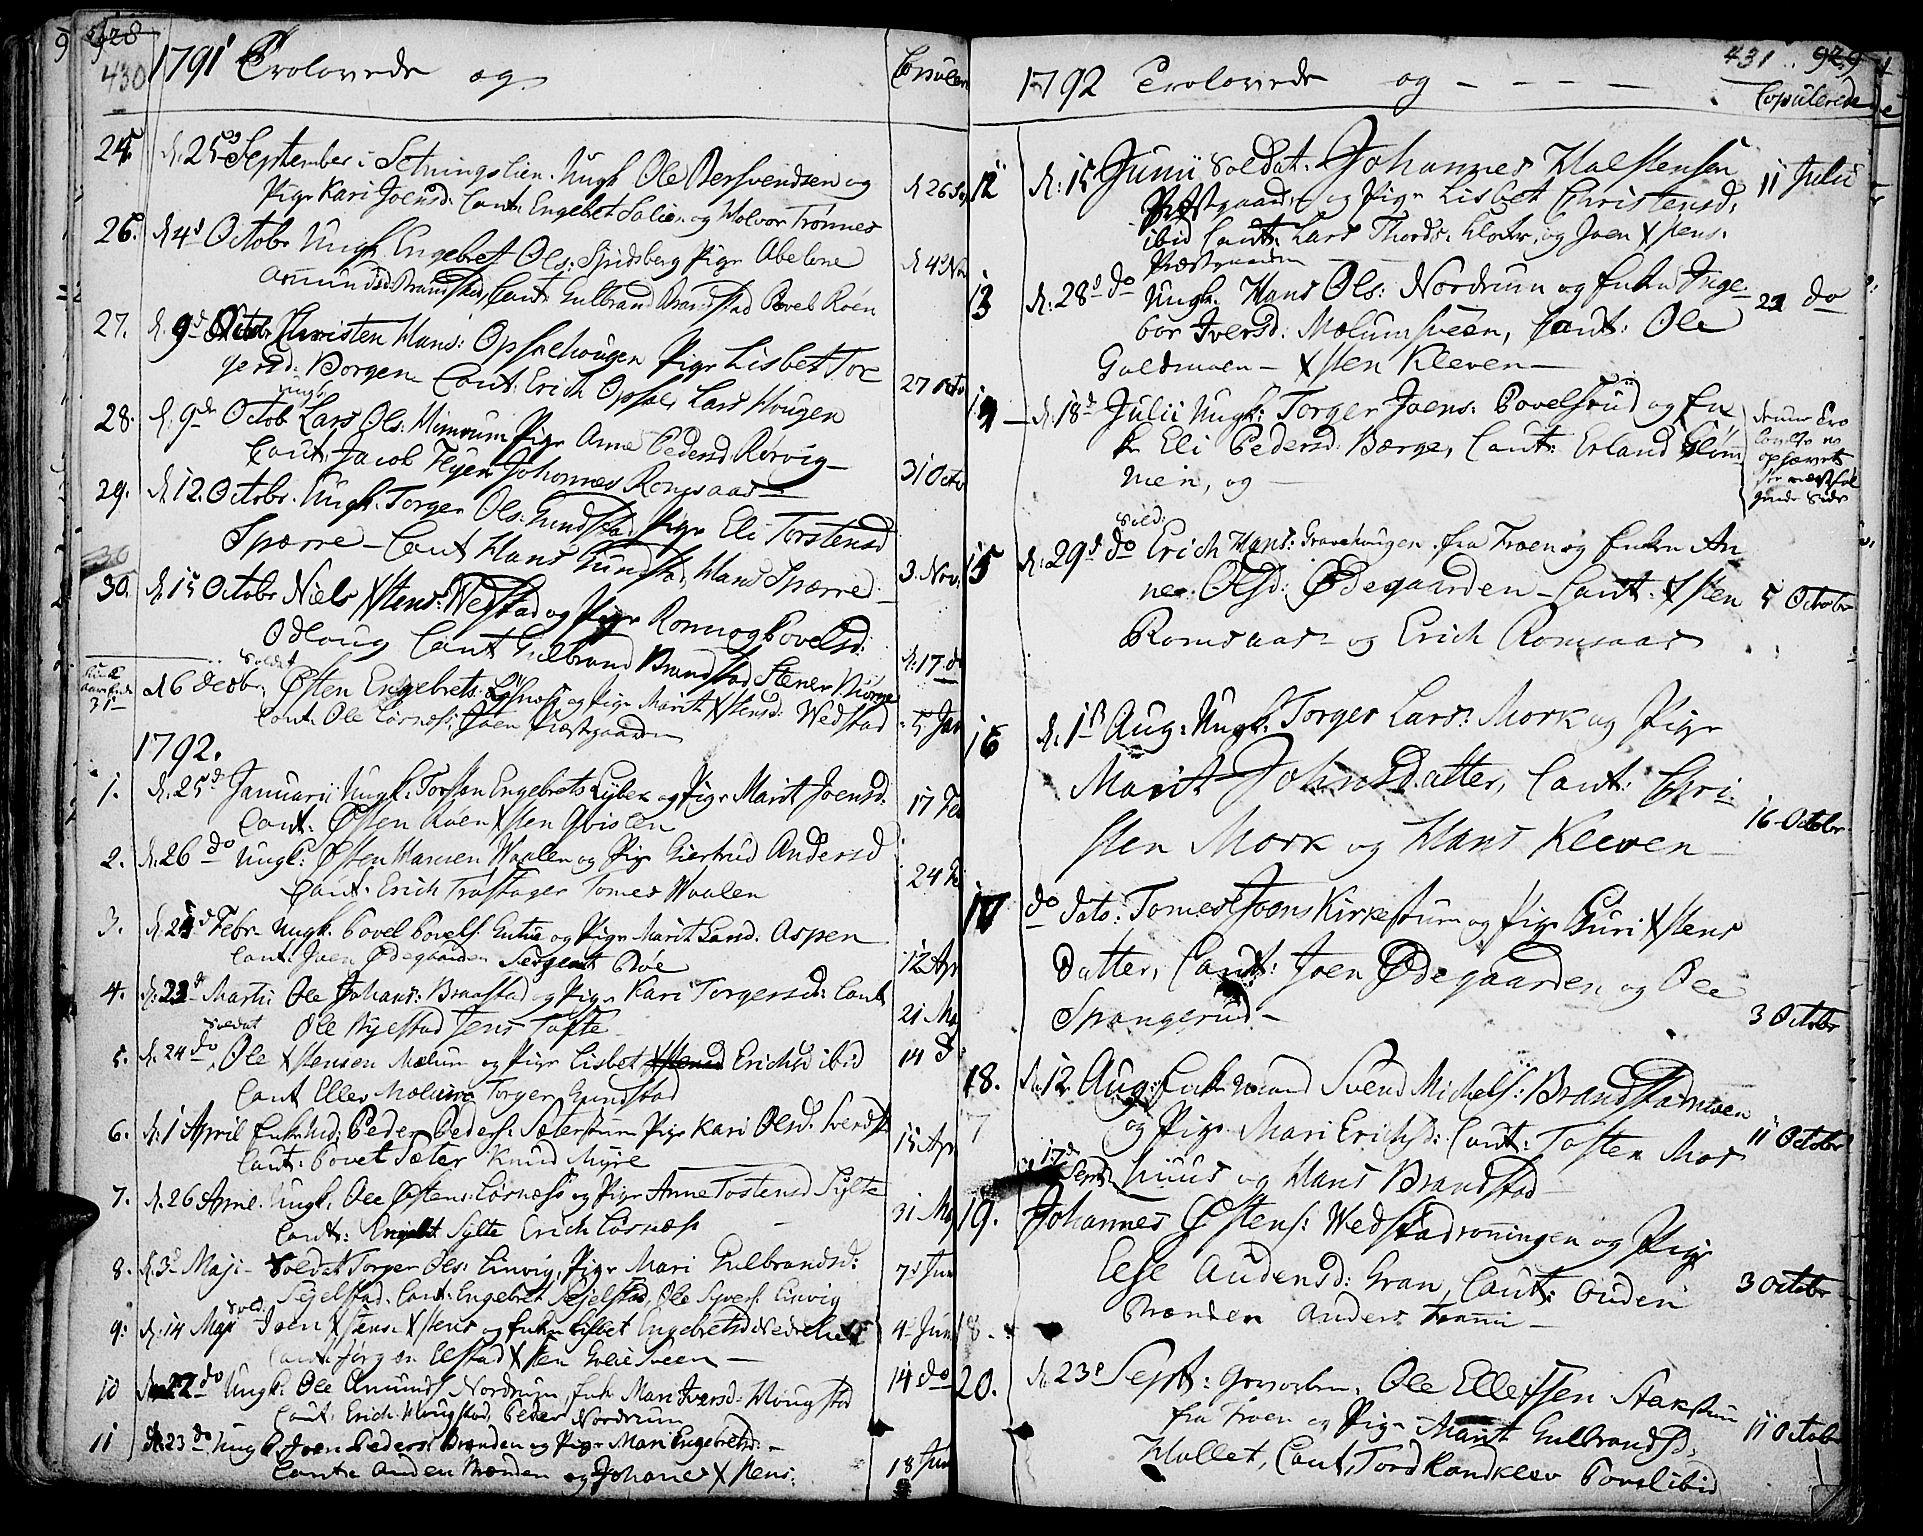 SAH, Ringebu prestekontor, Ministerialbok nr. 3, 1781-1820, s. 430-431